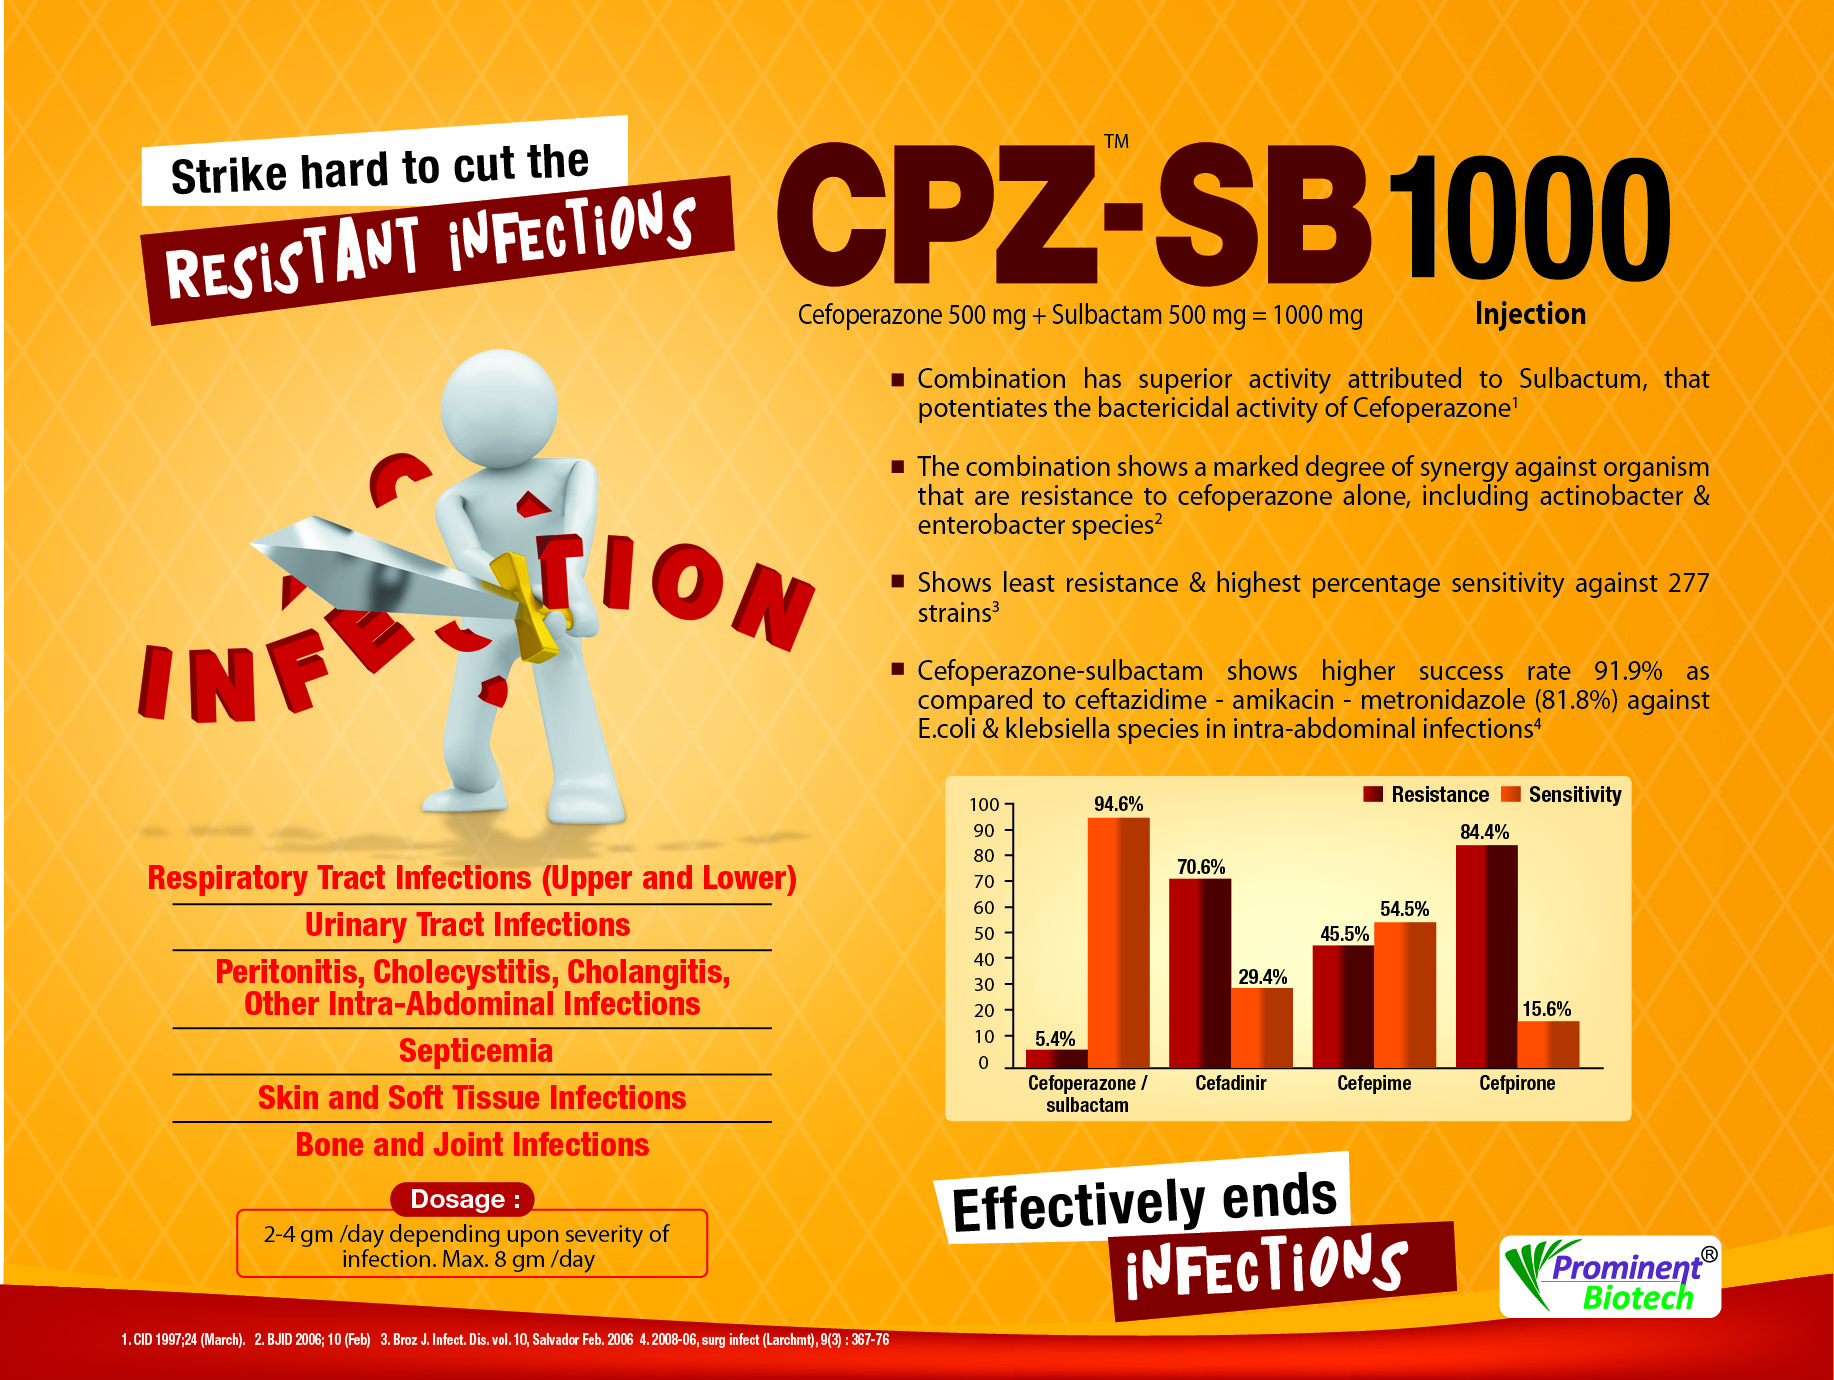 Cefoperazone 500 Mg & Sulbactam 500 Mg Eqvt 1 Gm Injection